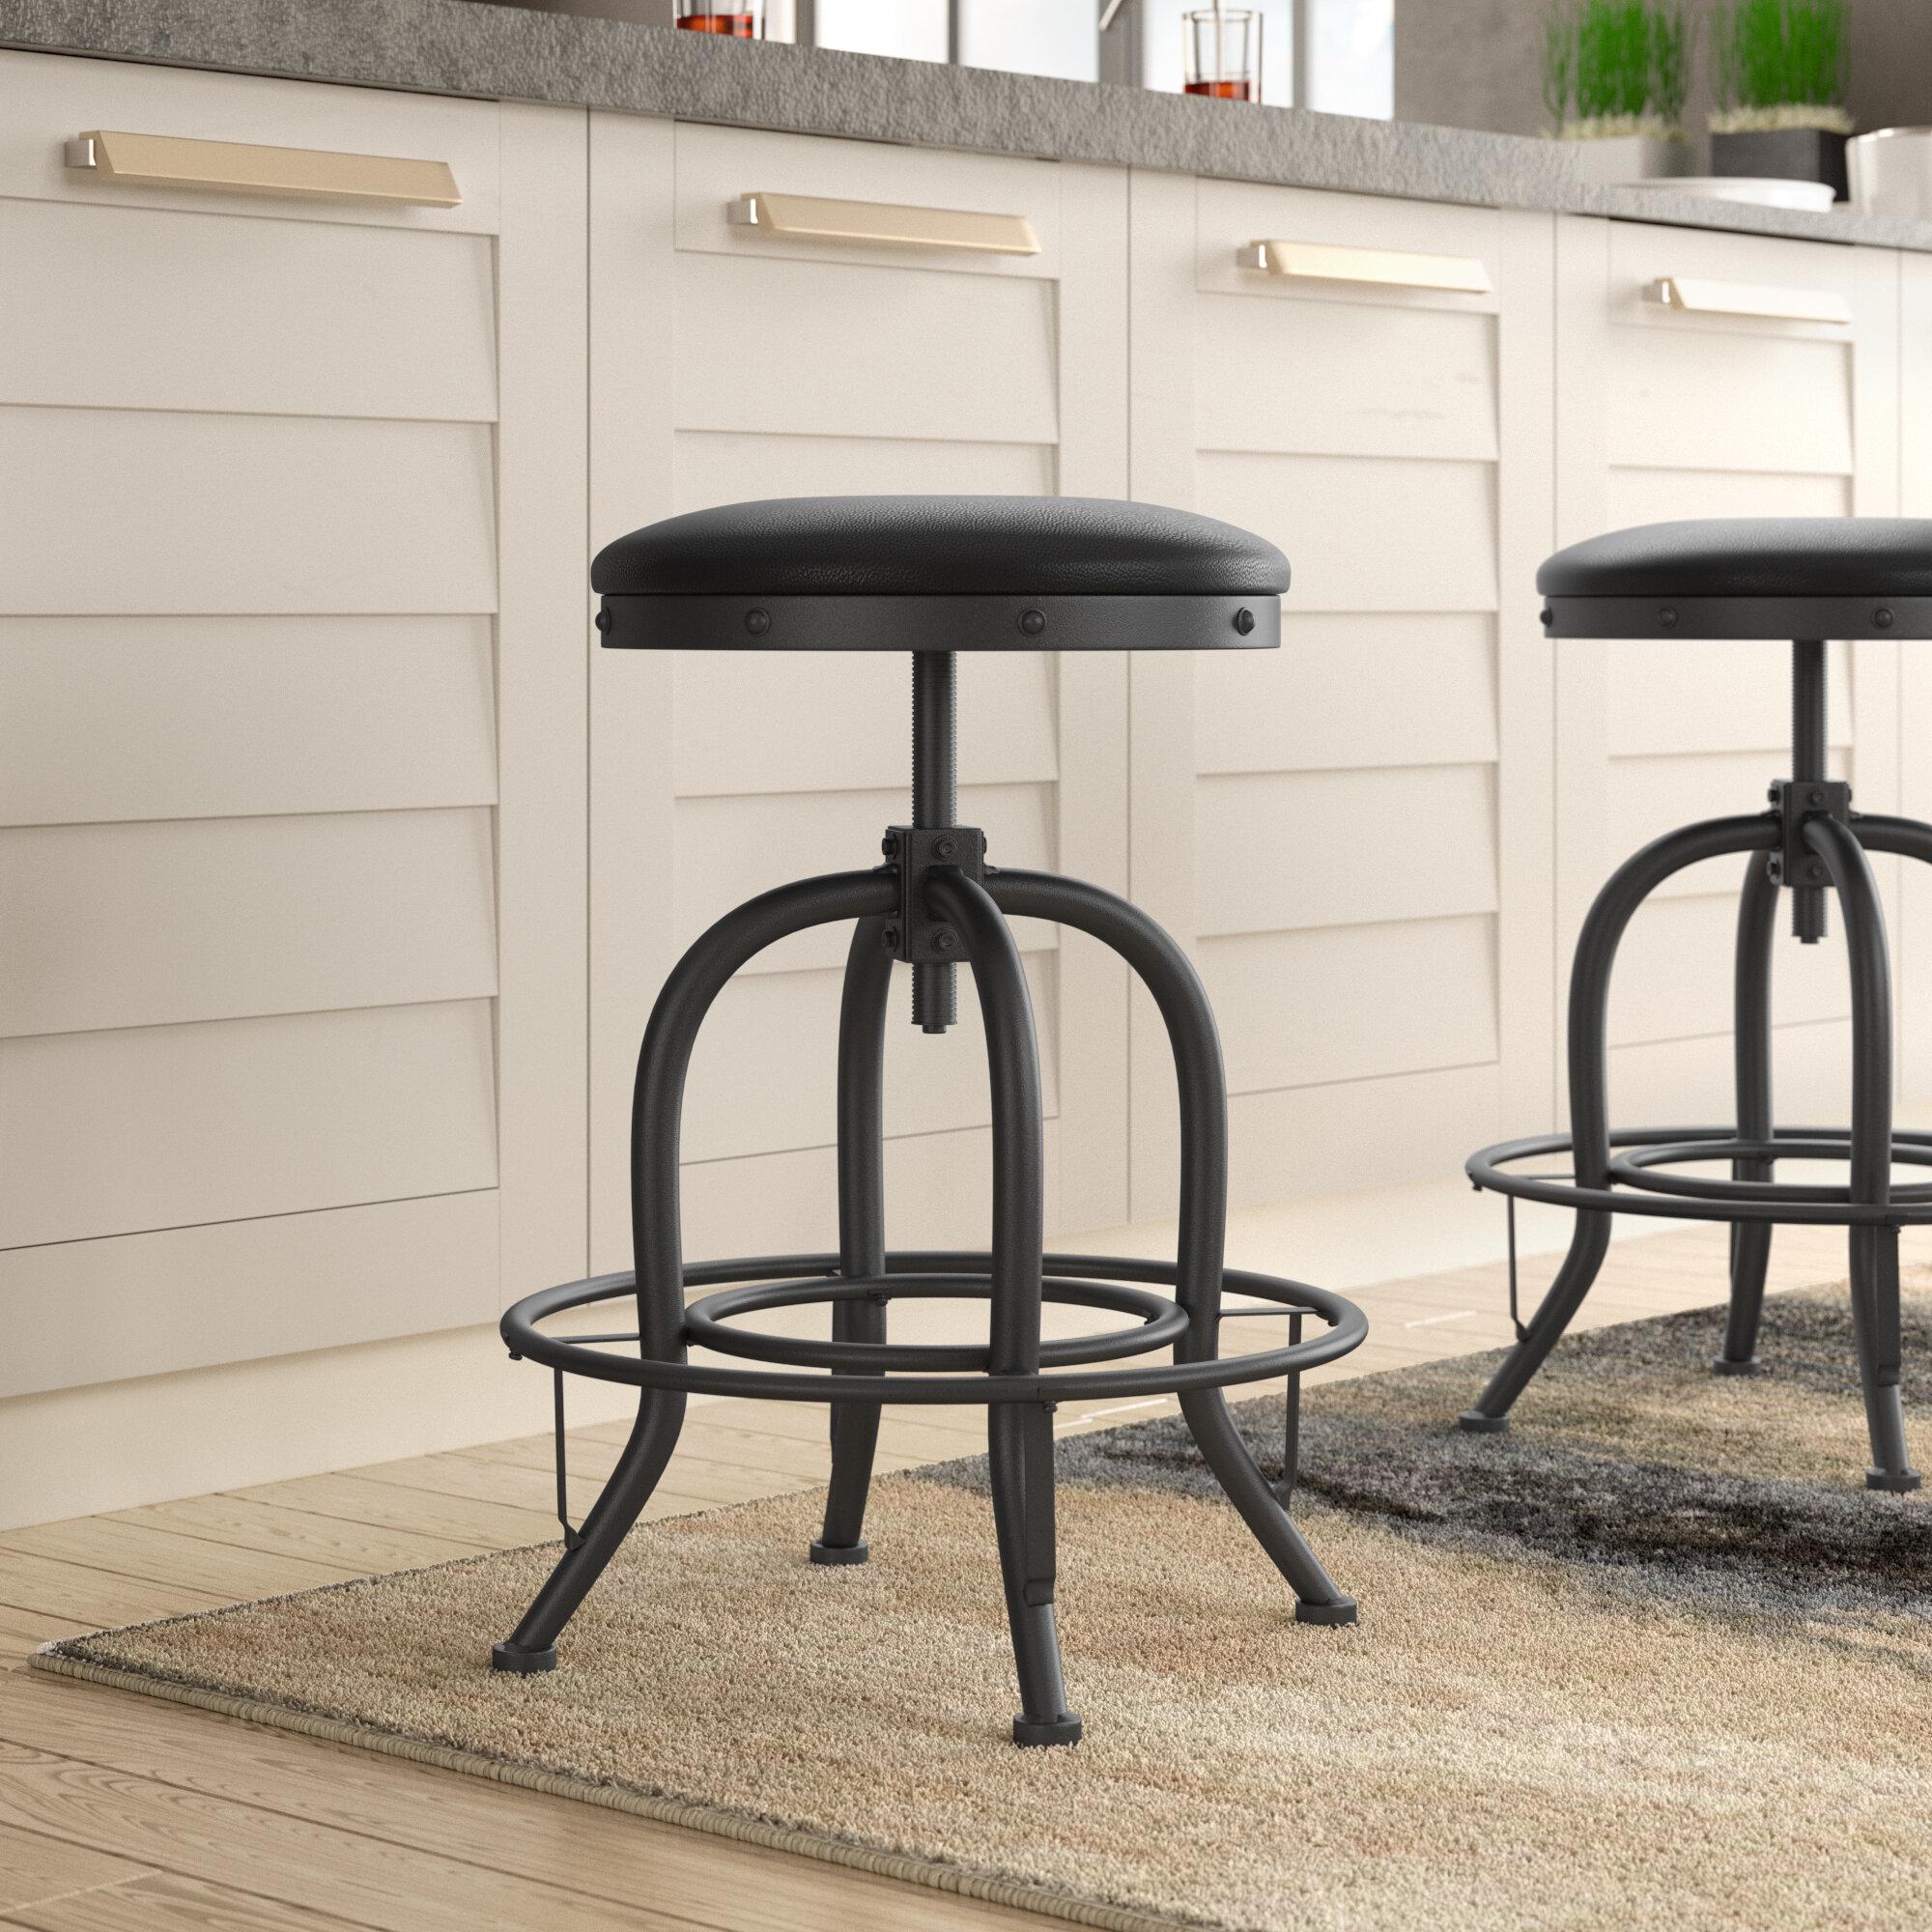 Stupendous Danita Adjustable Height Swivel Bar Stool Gamerscity Chair Design For Home Gamerscityorg